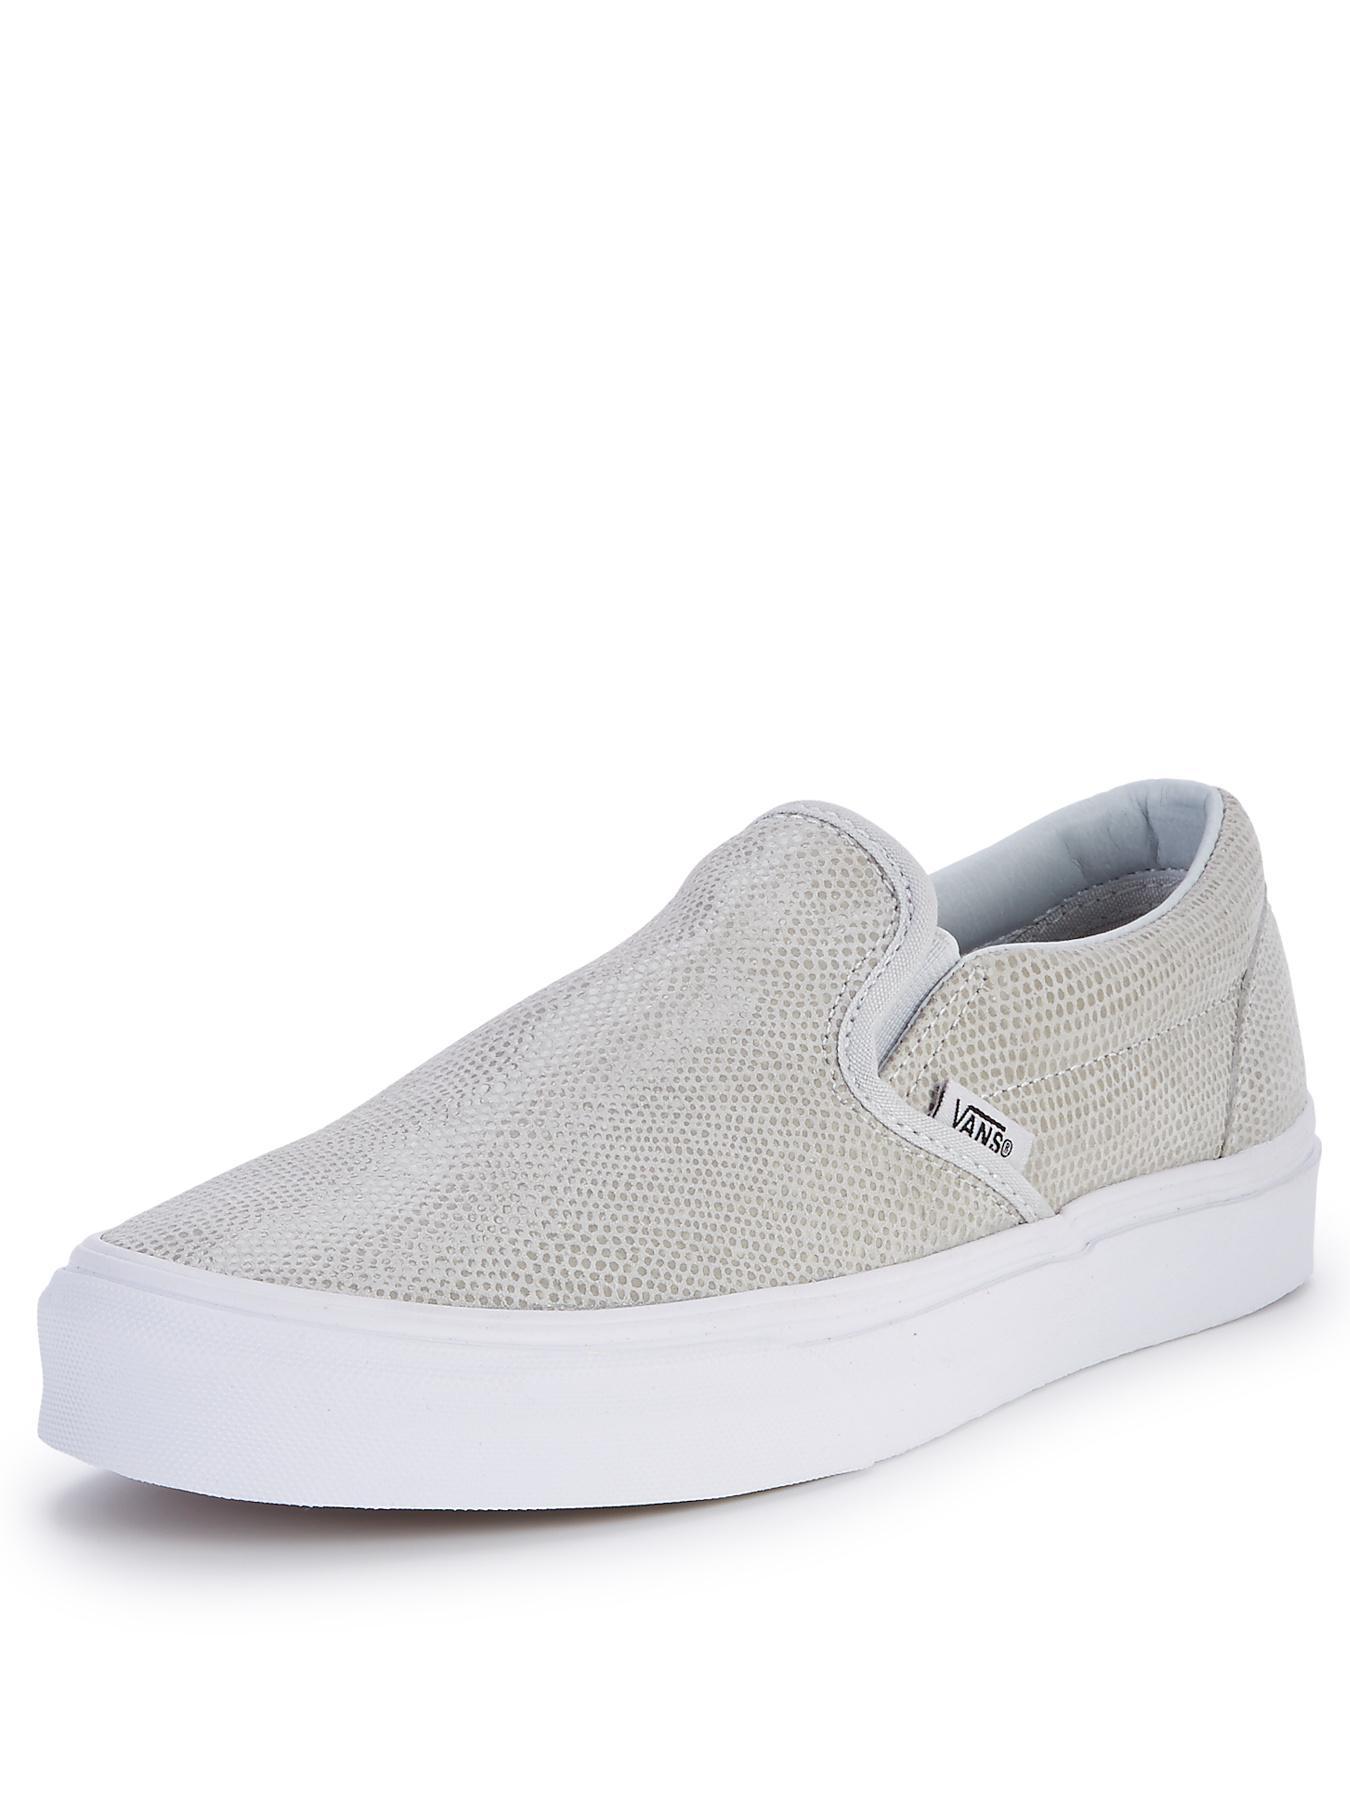 Vans Classic Slip-On Snake Plimsolls - Grey, Grey